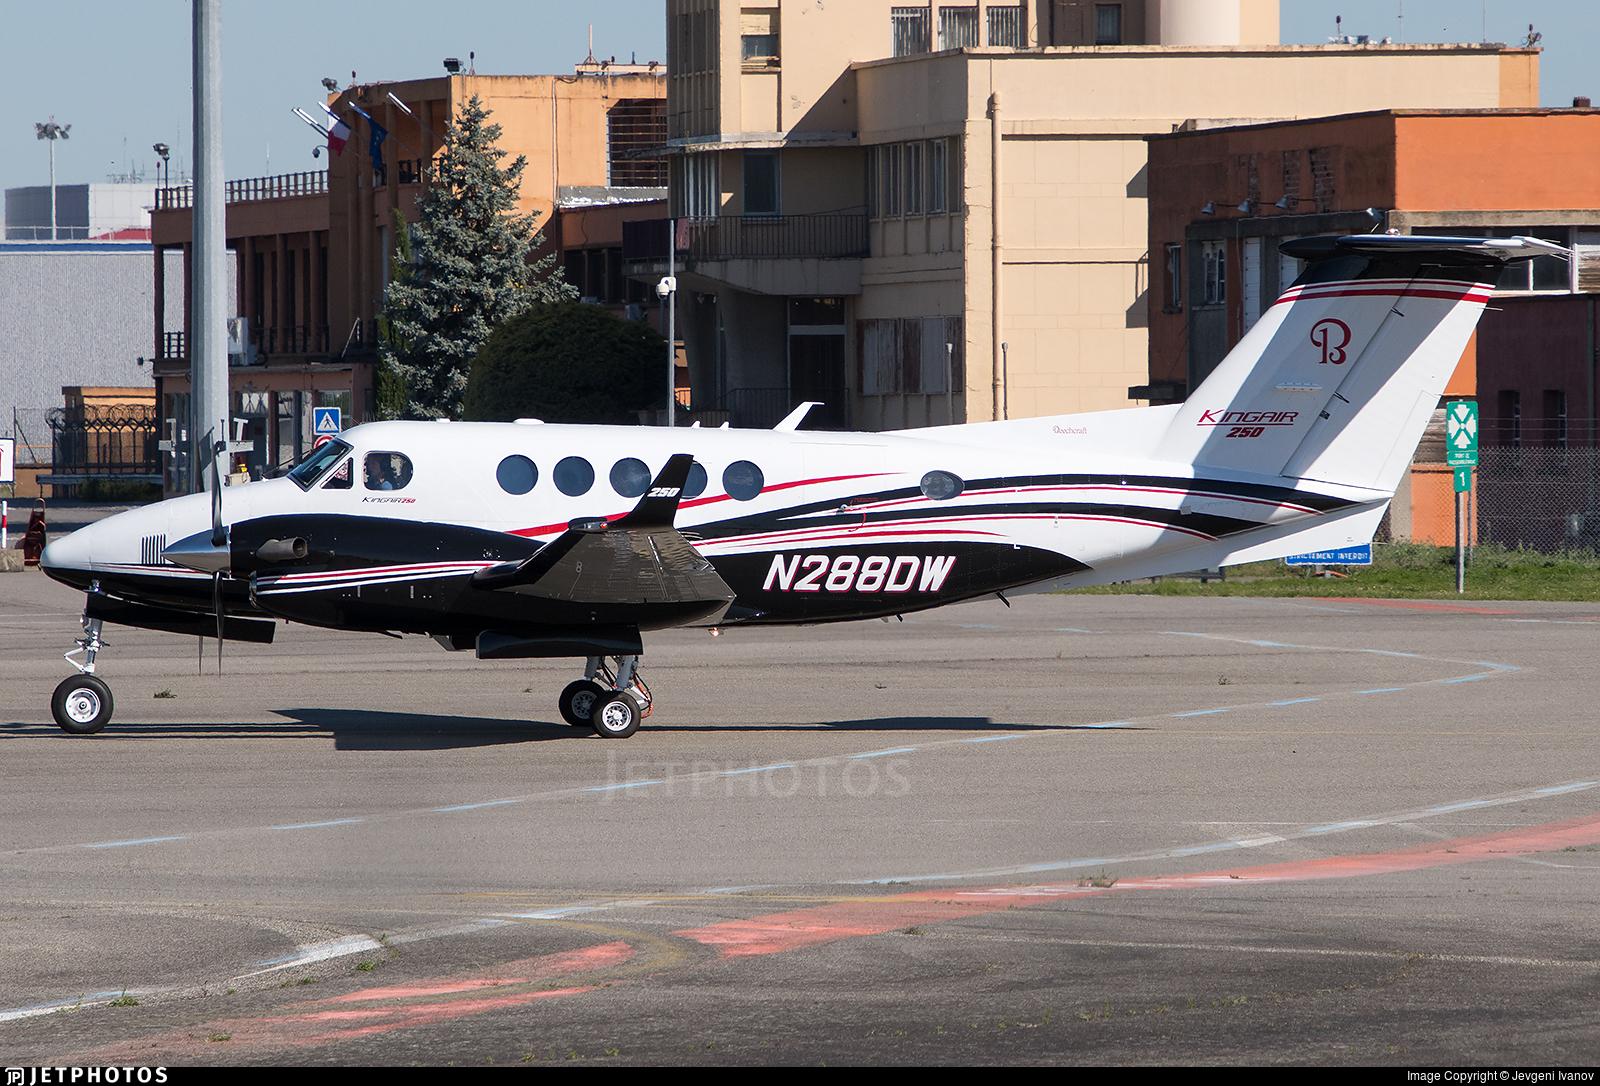 N288DW   Beechcraft 250 King Air   Textron Aviation   Jevgeni Ivanov